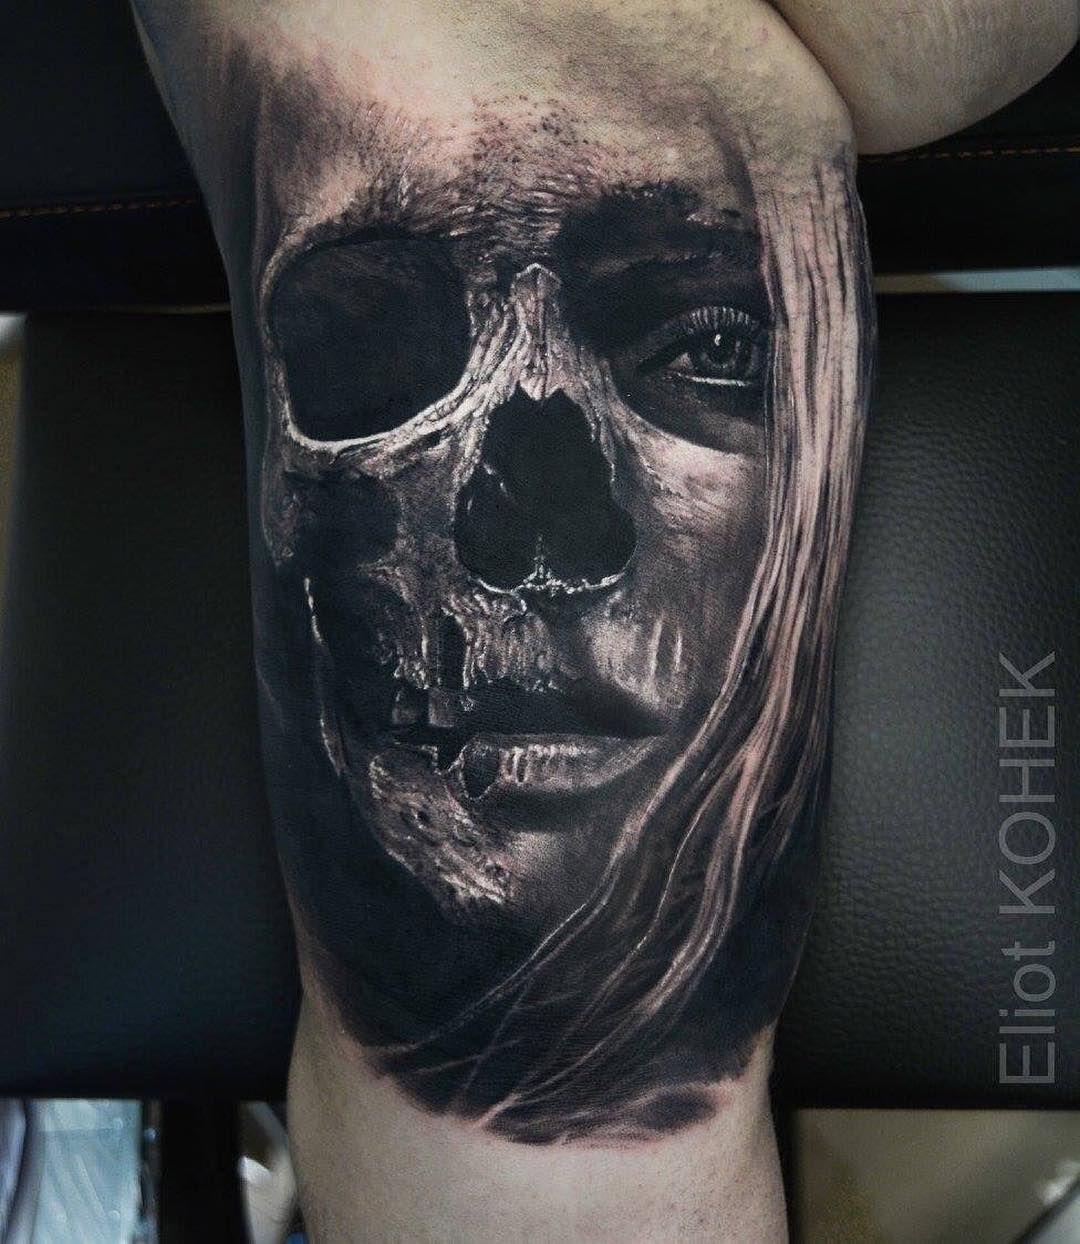 Dark Realism From Eliot Kohek Skull Face Tattoo Face Tattoos